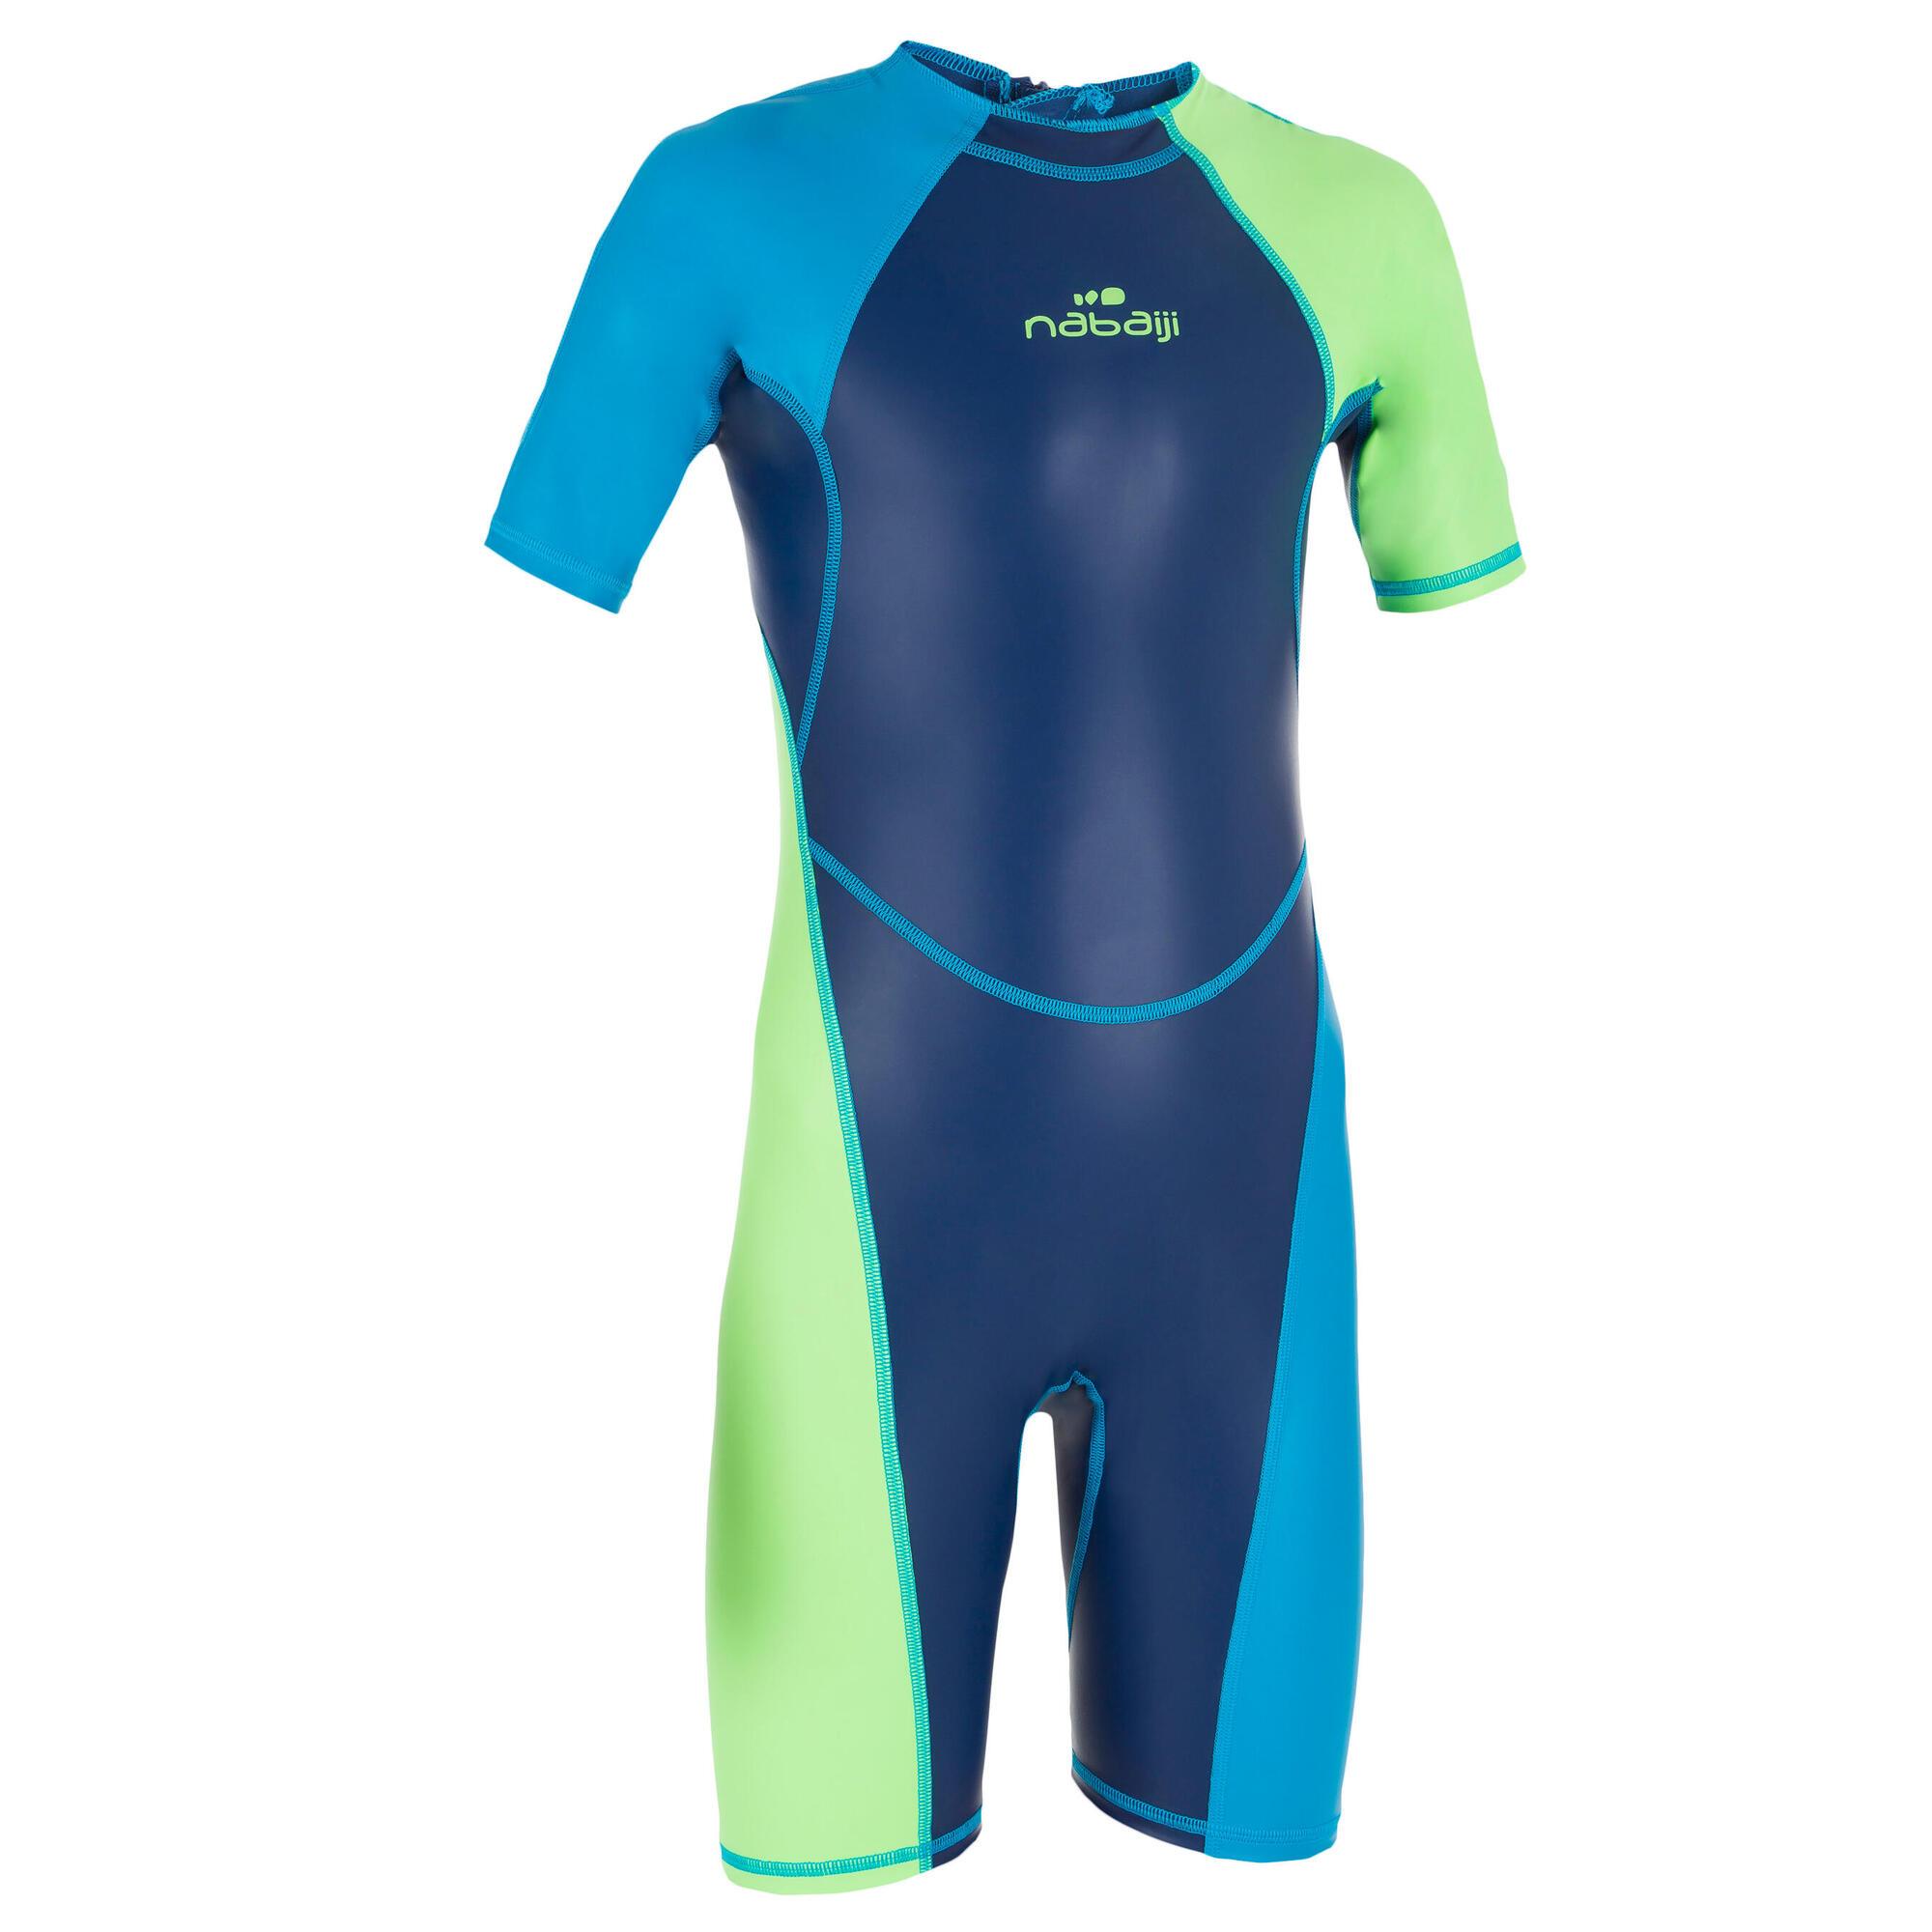 Maillot de bain shorty gar on kloupi bleu vert nabaiji - Maillot de bain piscine decathlon ...